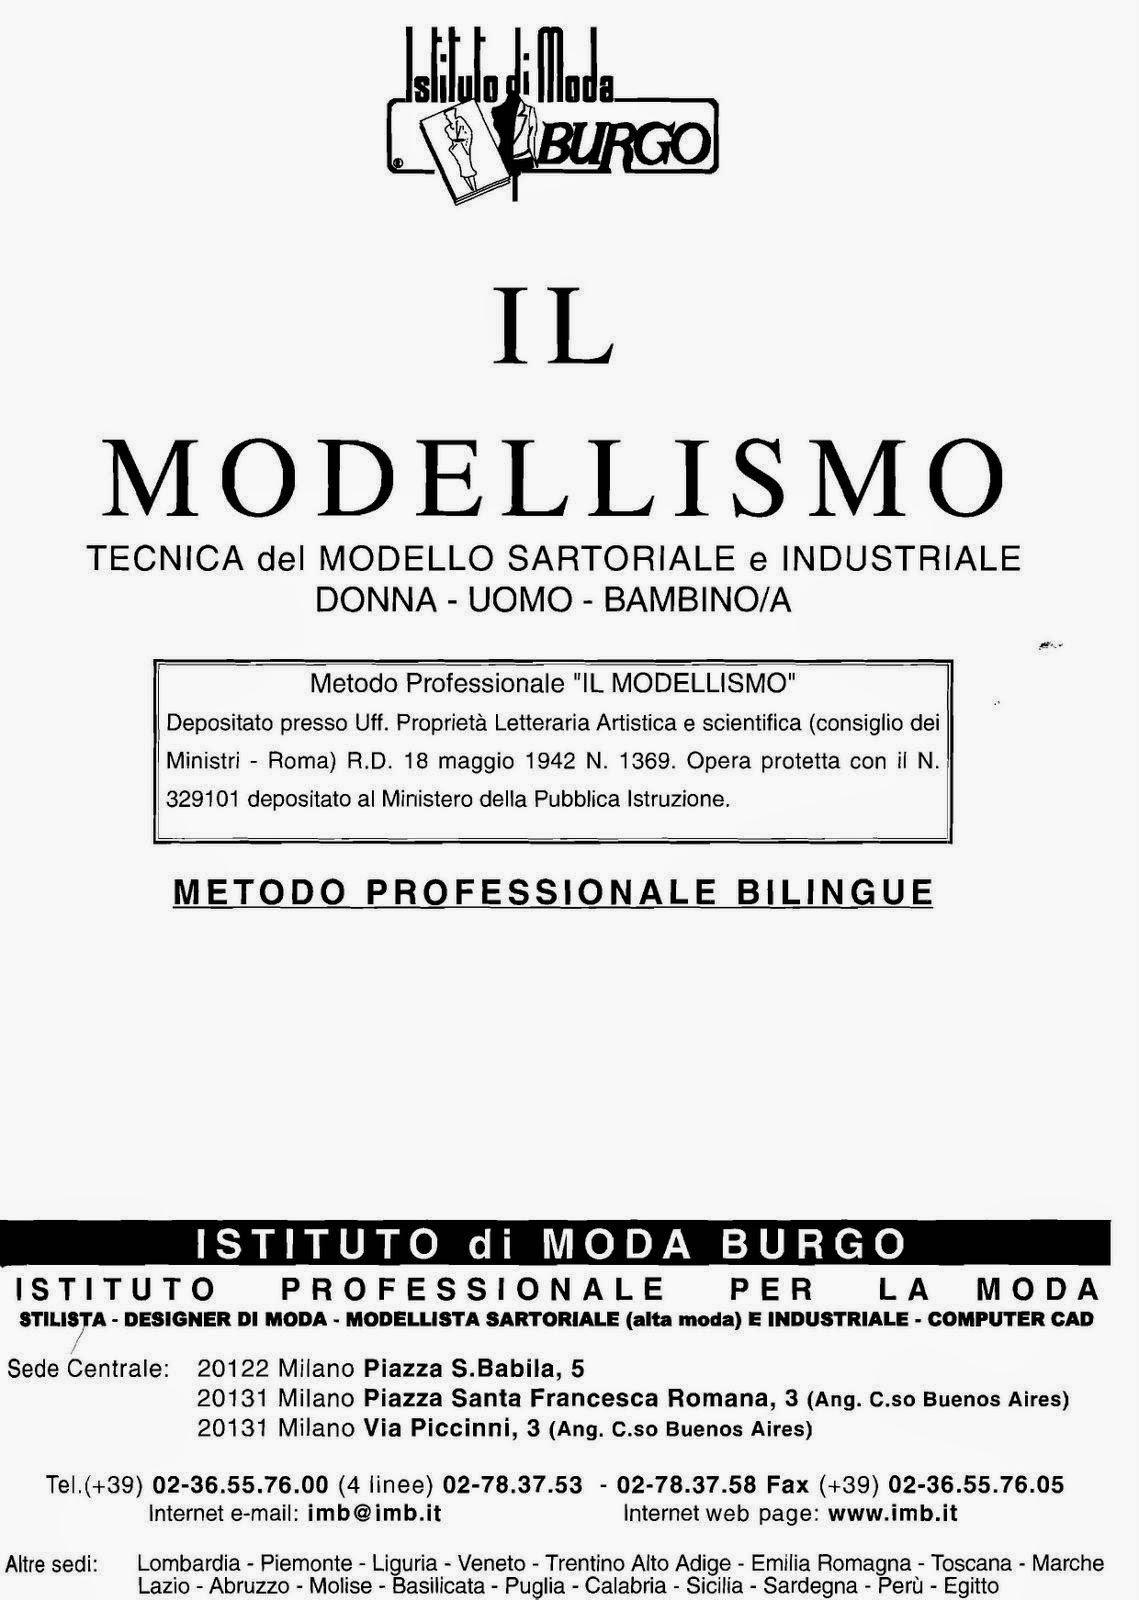 4 il modellismo modelist kitaplar for Il modellismo burgo